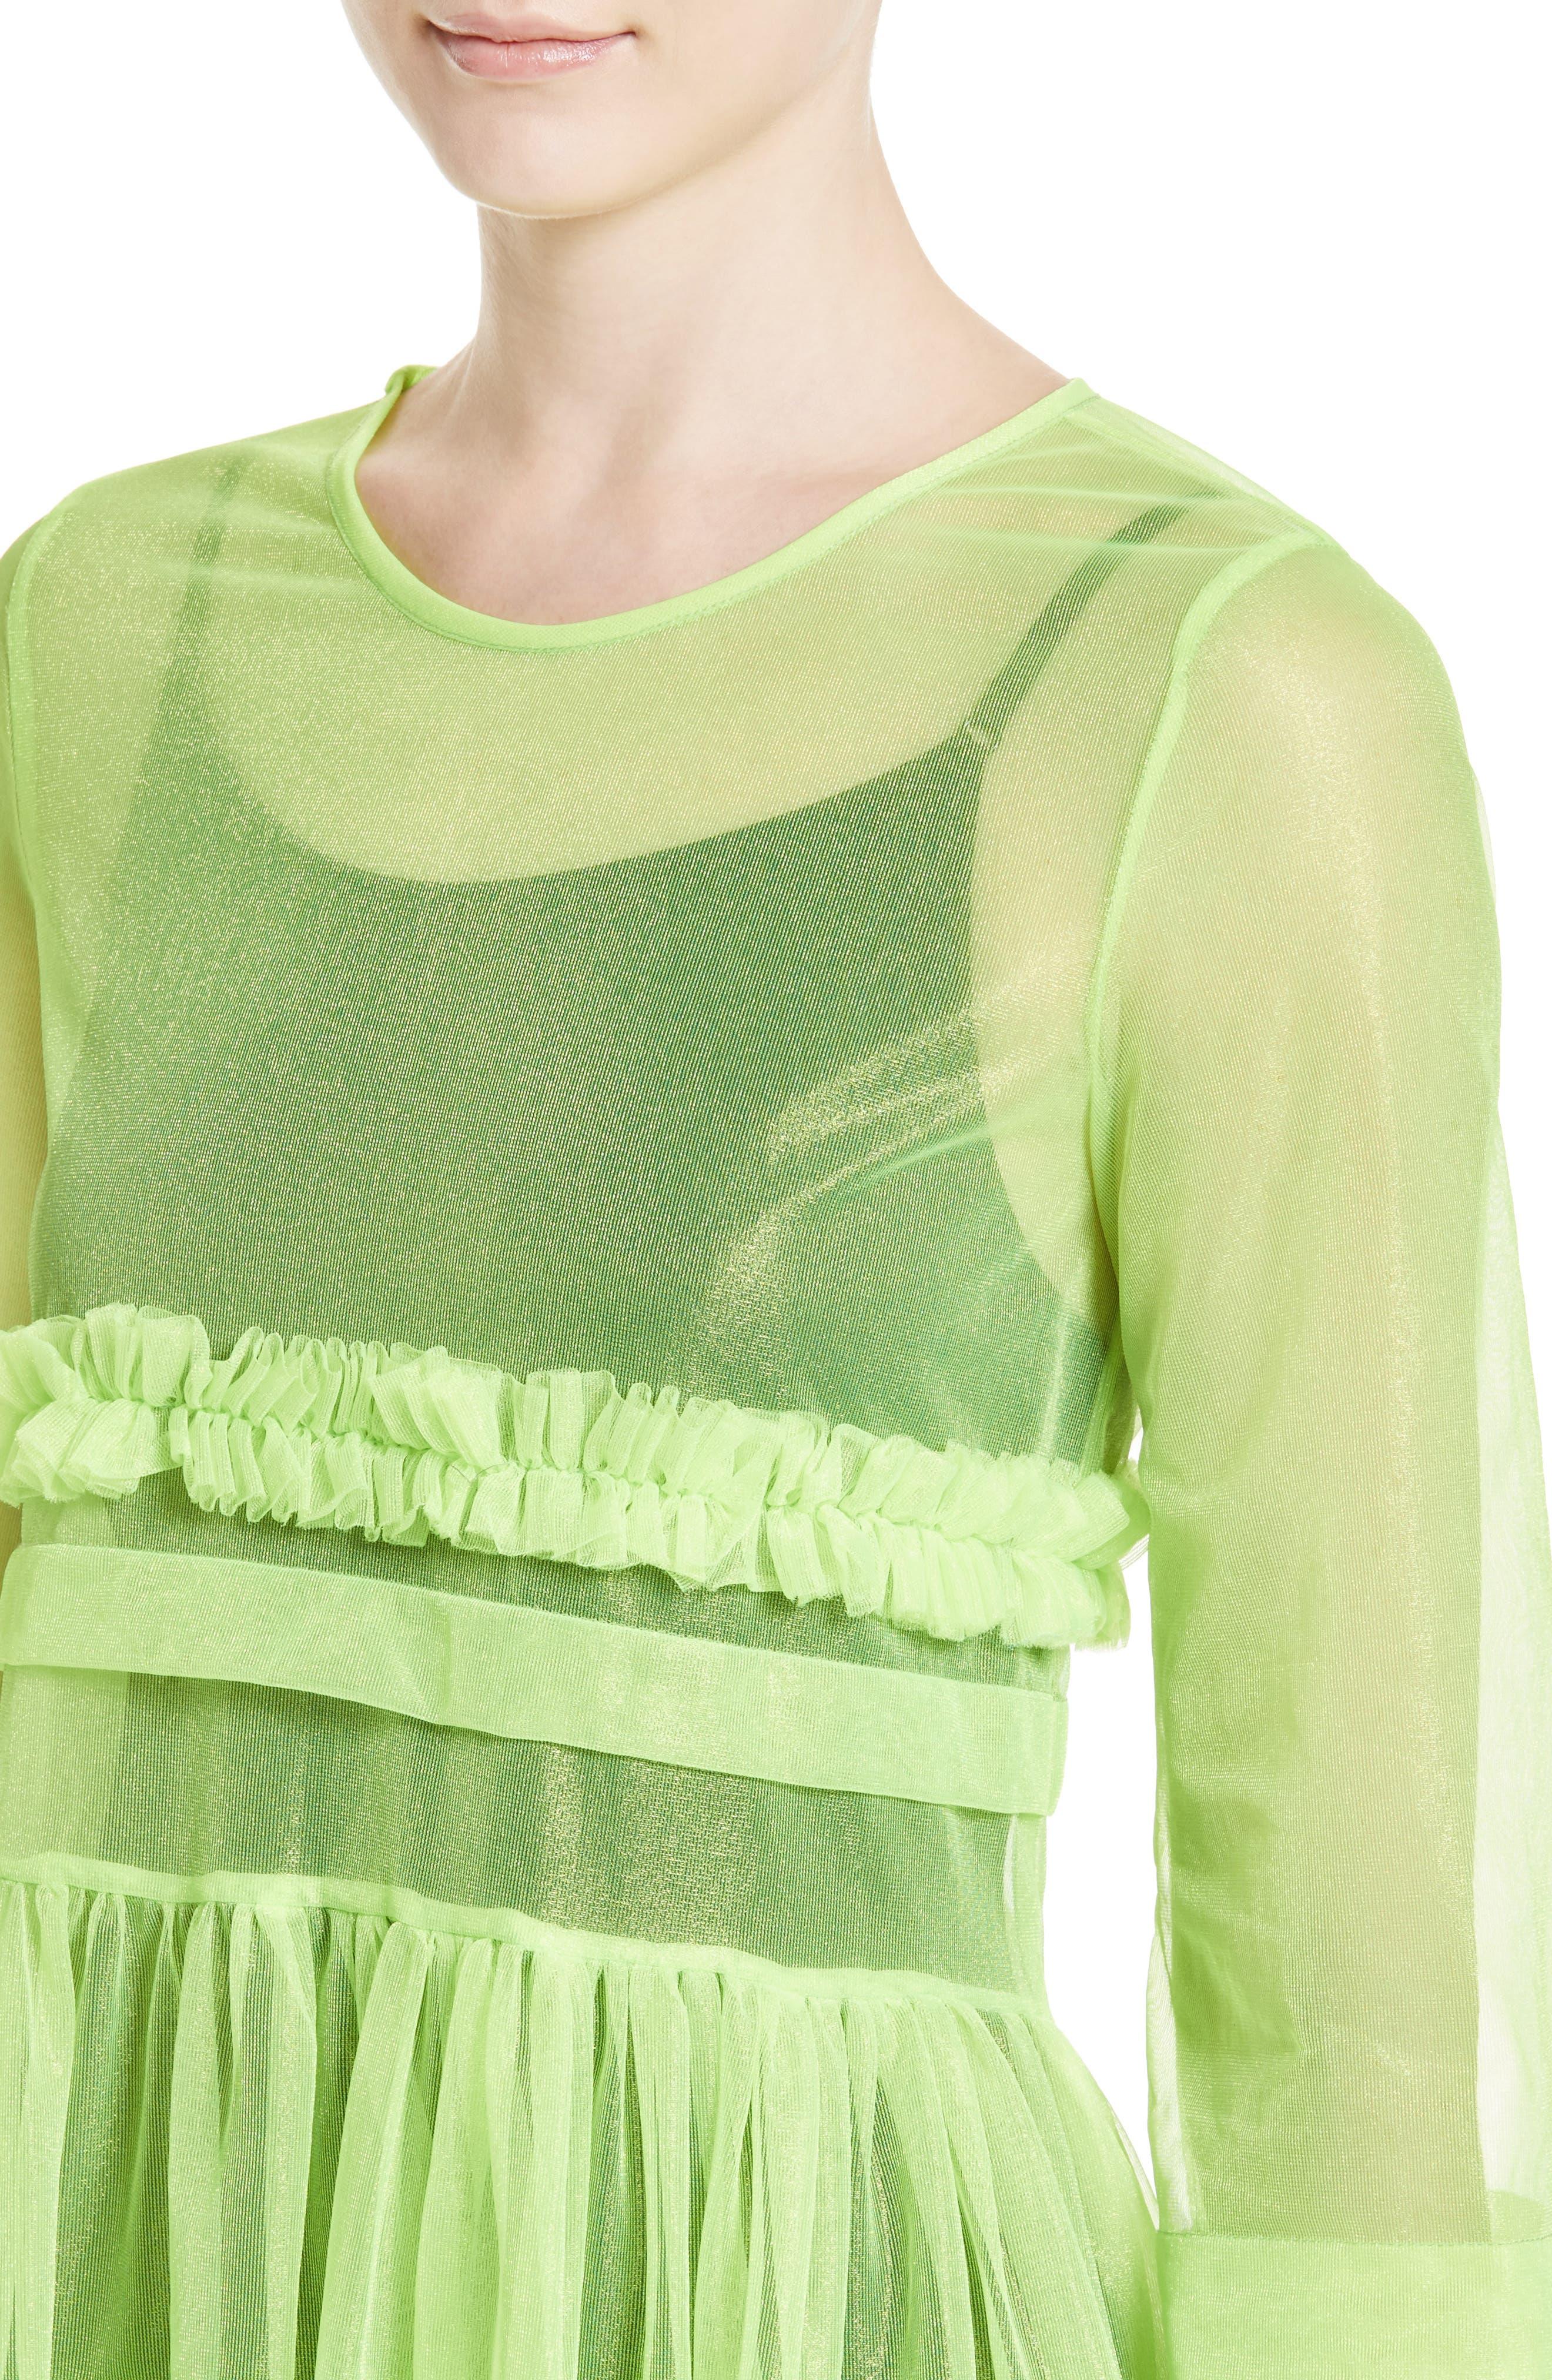 Patty Dress,                             Alternate thumbnail 4, color,                             300